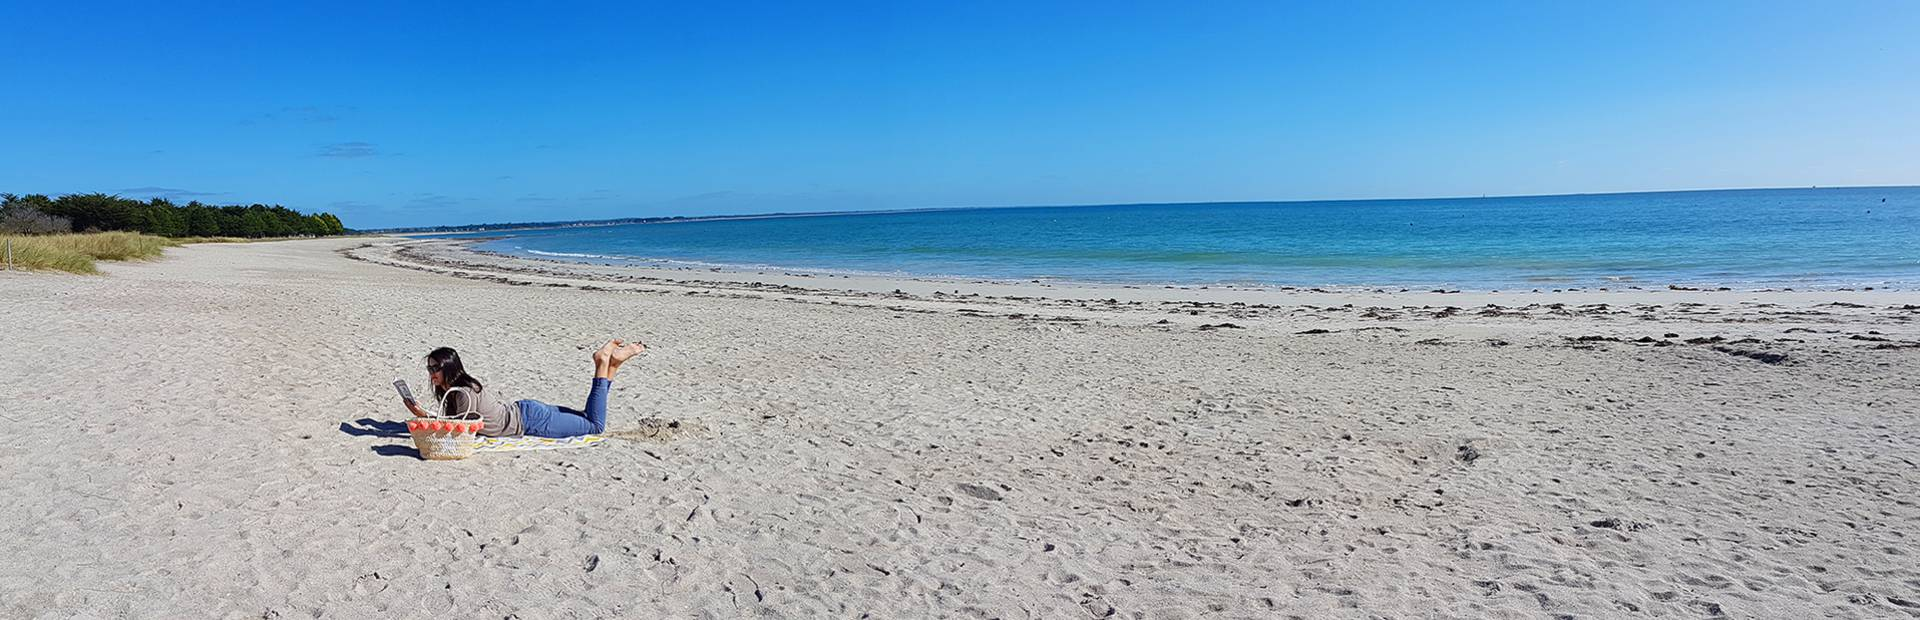 Faulenzen am Strand in Ile Tudy im Pays Bigouden-® E Cleret